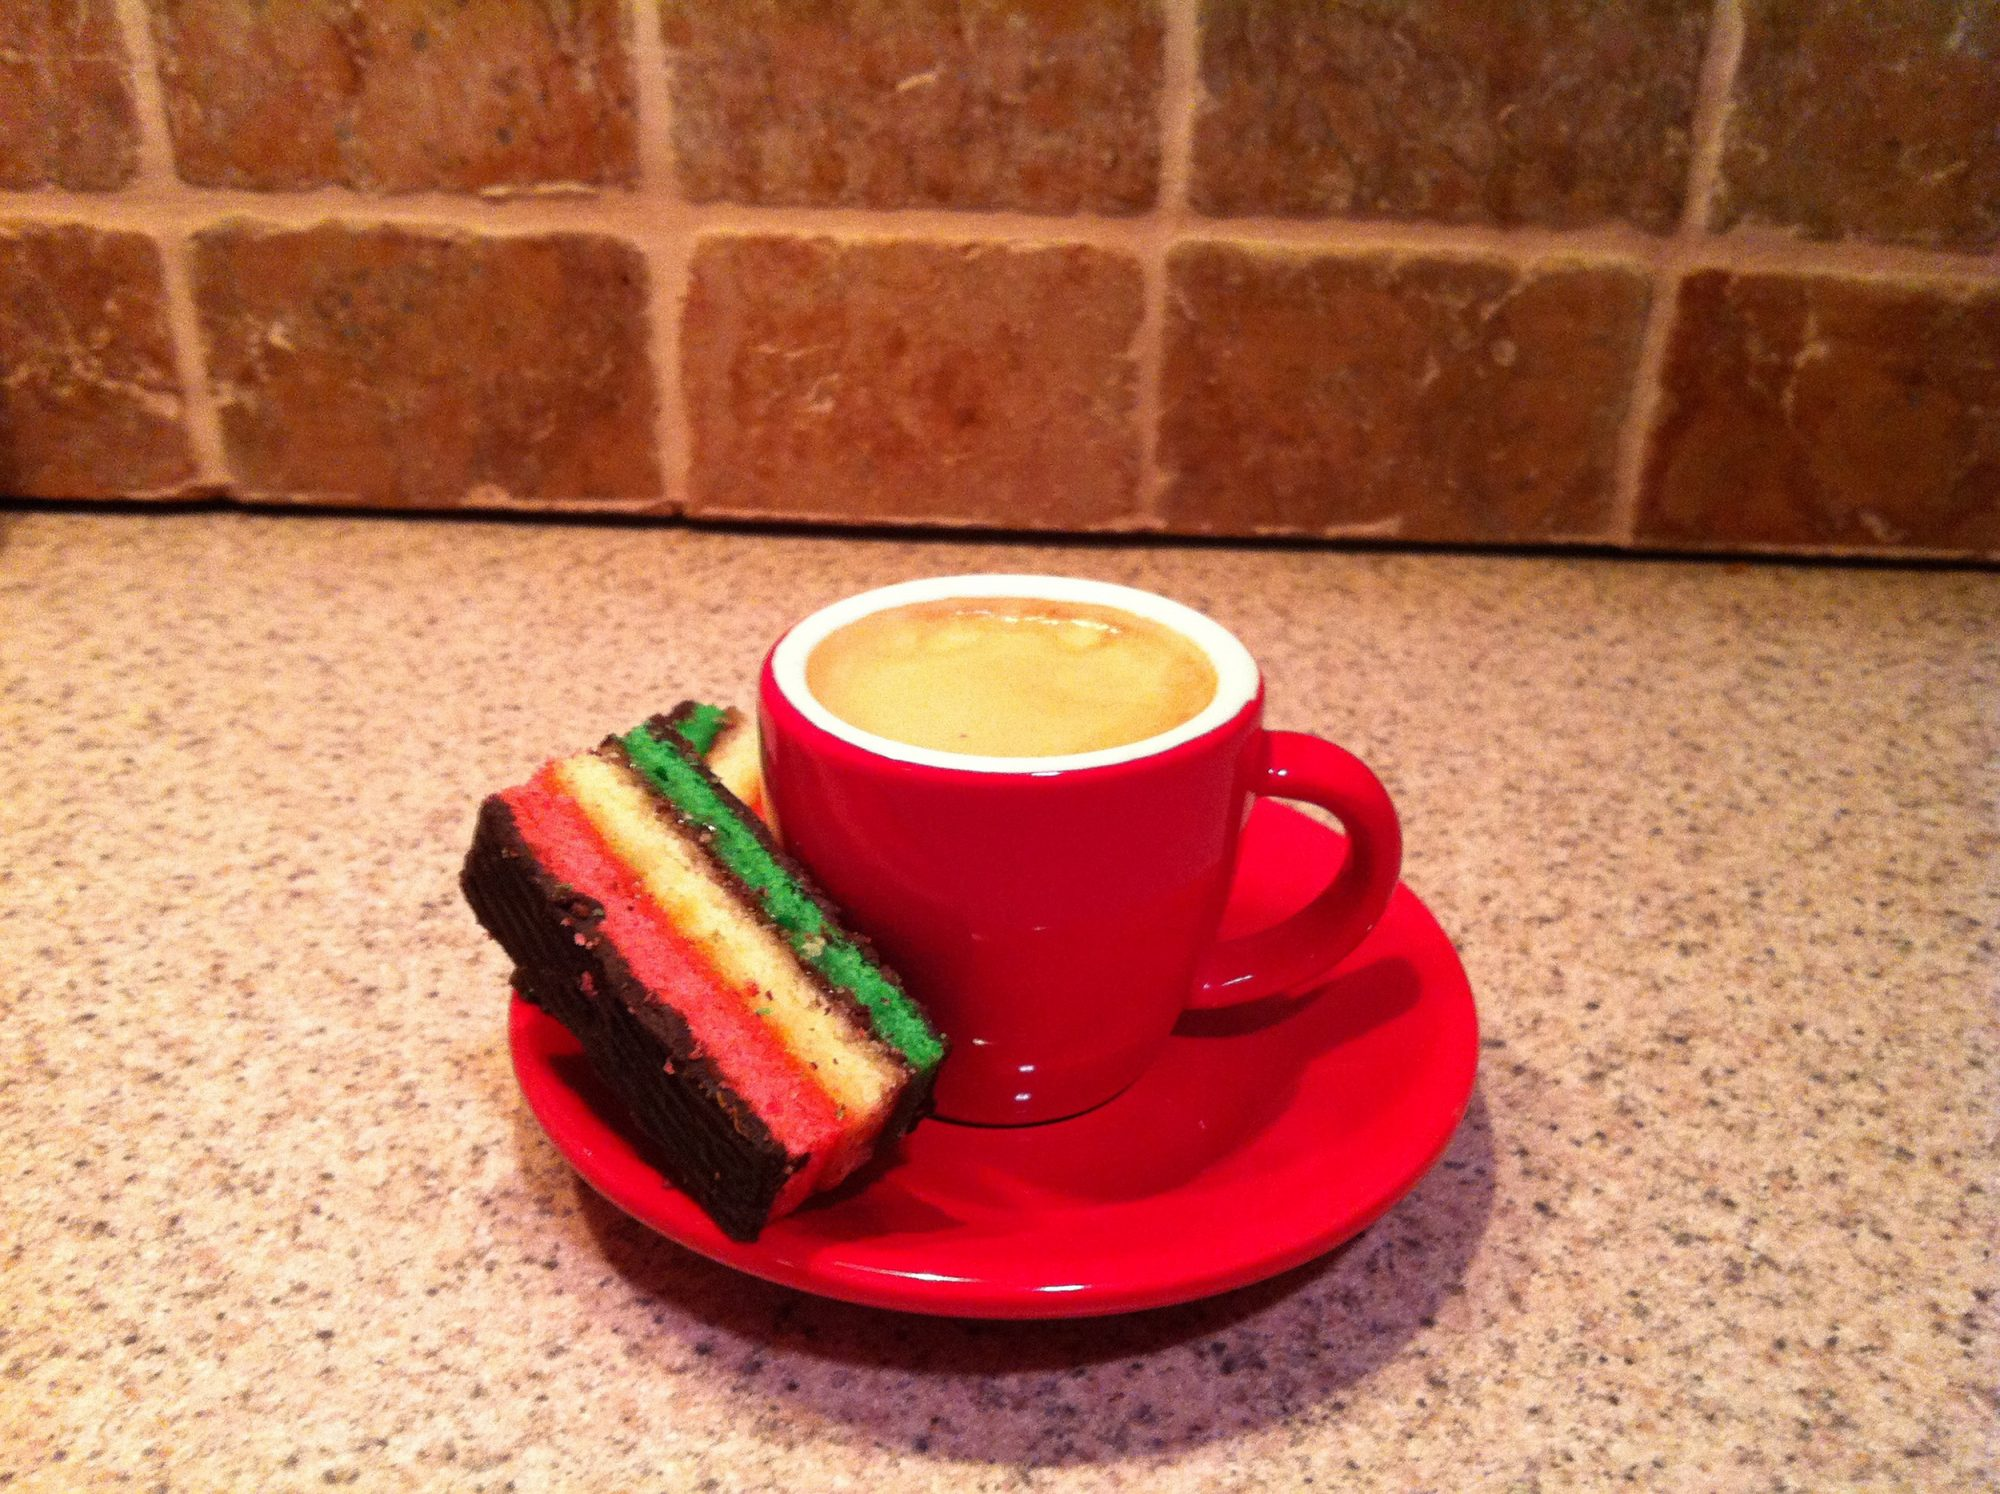 EC: The Italian Rainbow Cookie Doughnut Is Dessert Disguised as Breakfast